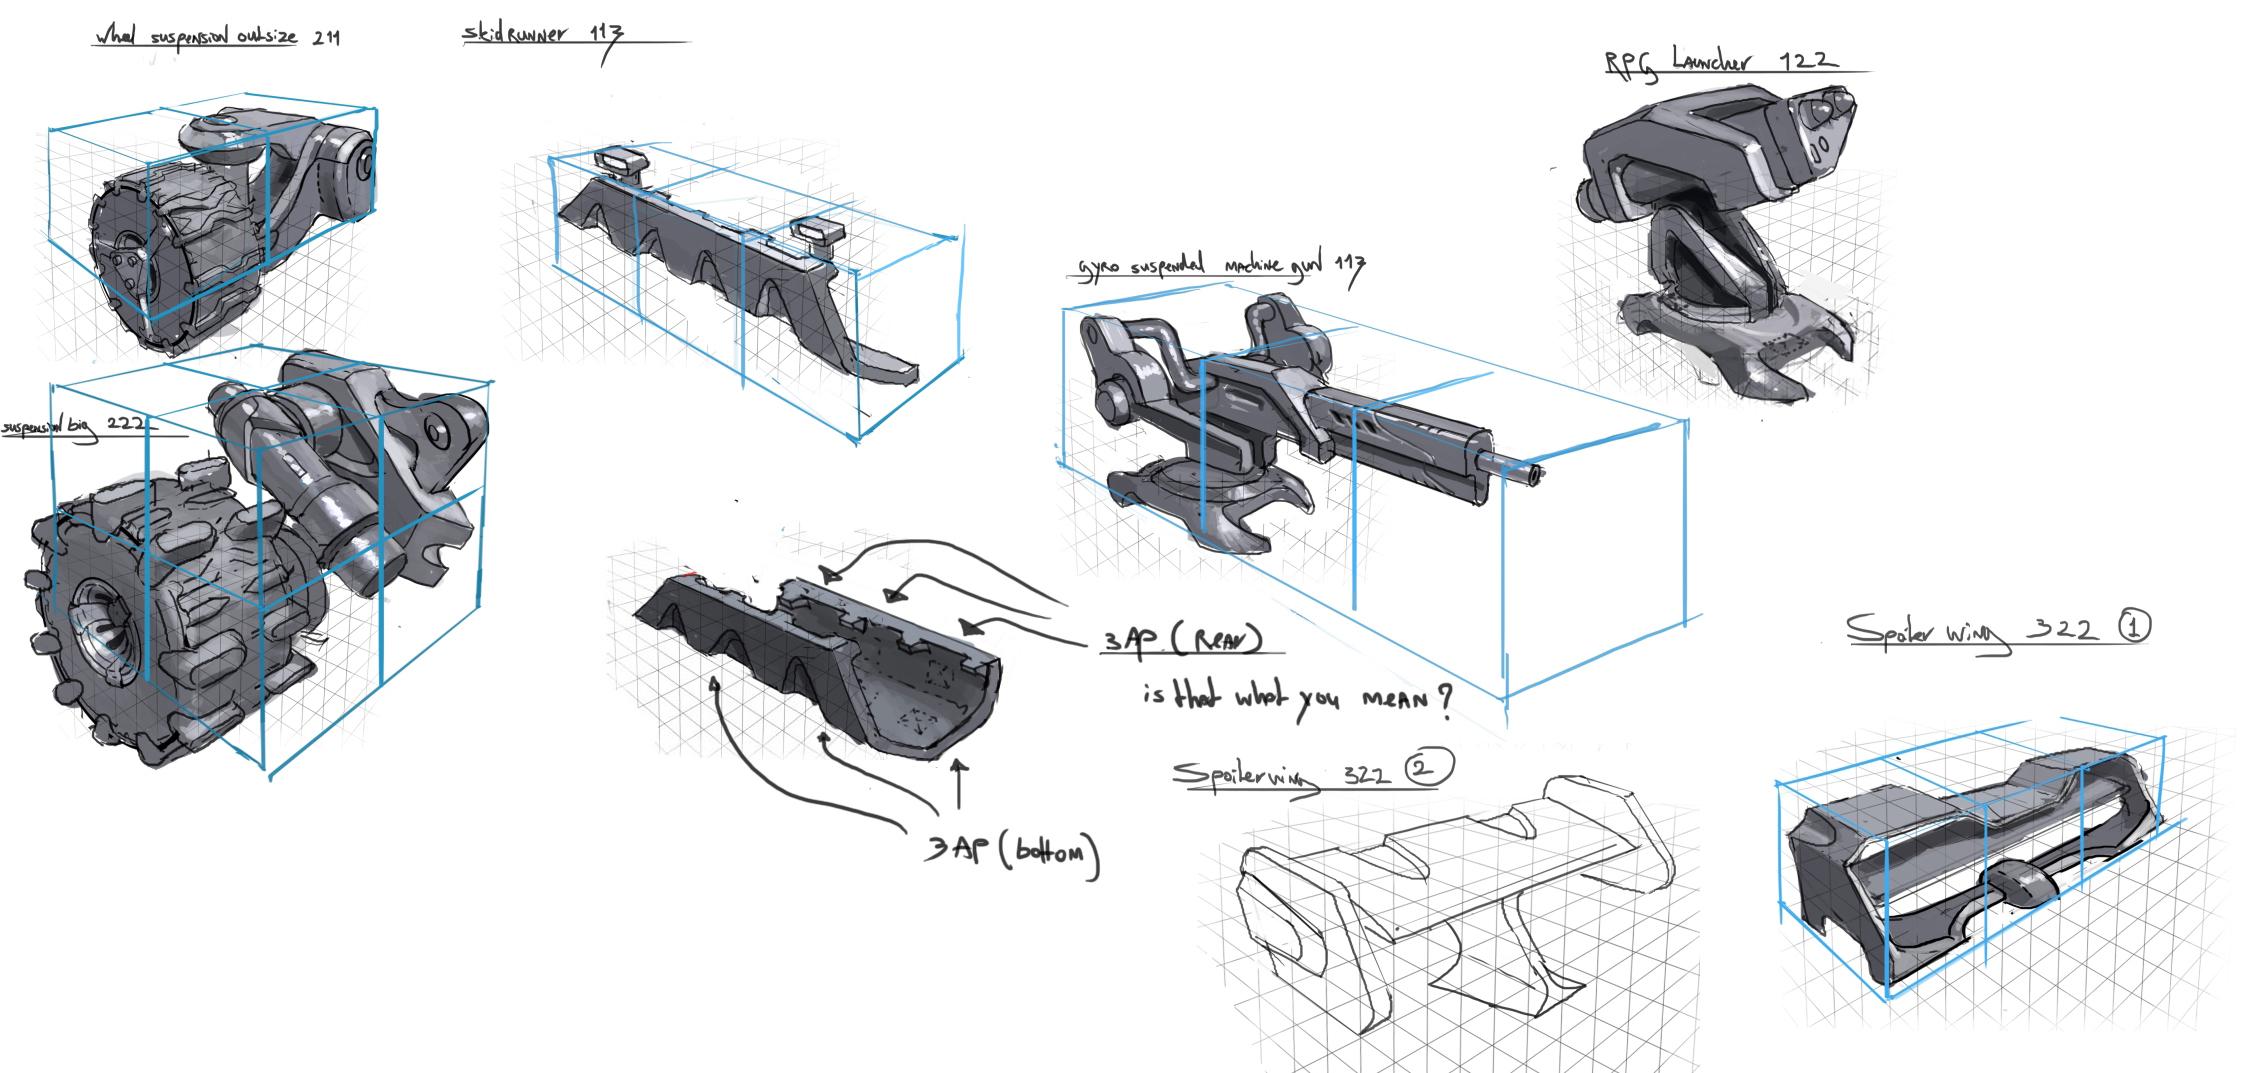 Concept art for Venture